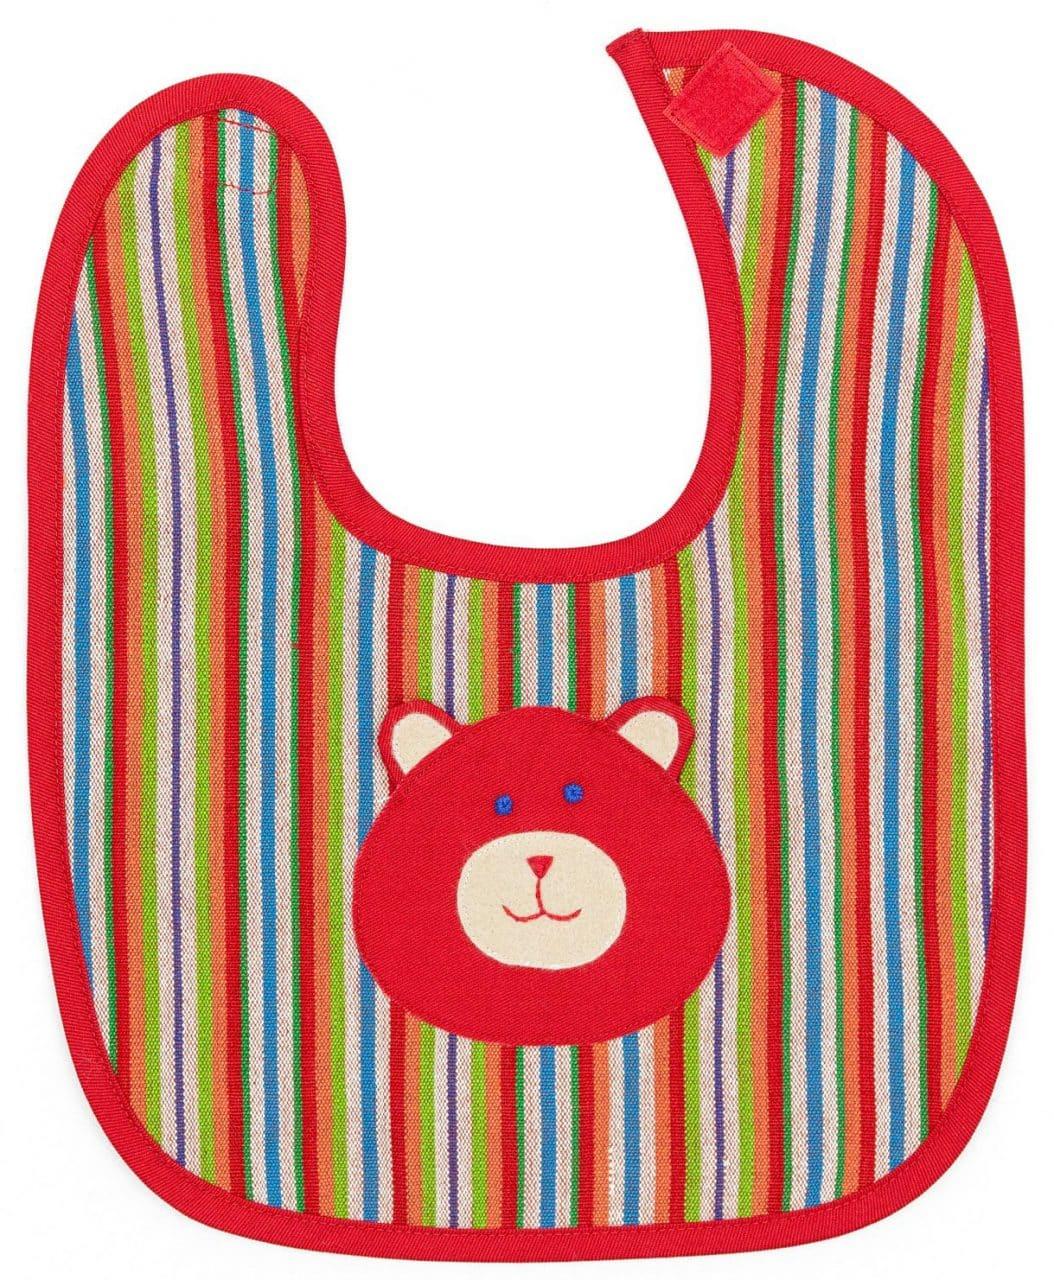 Bib - Baby Bear - A Variety of Colors